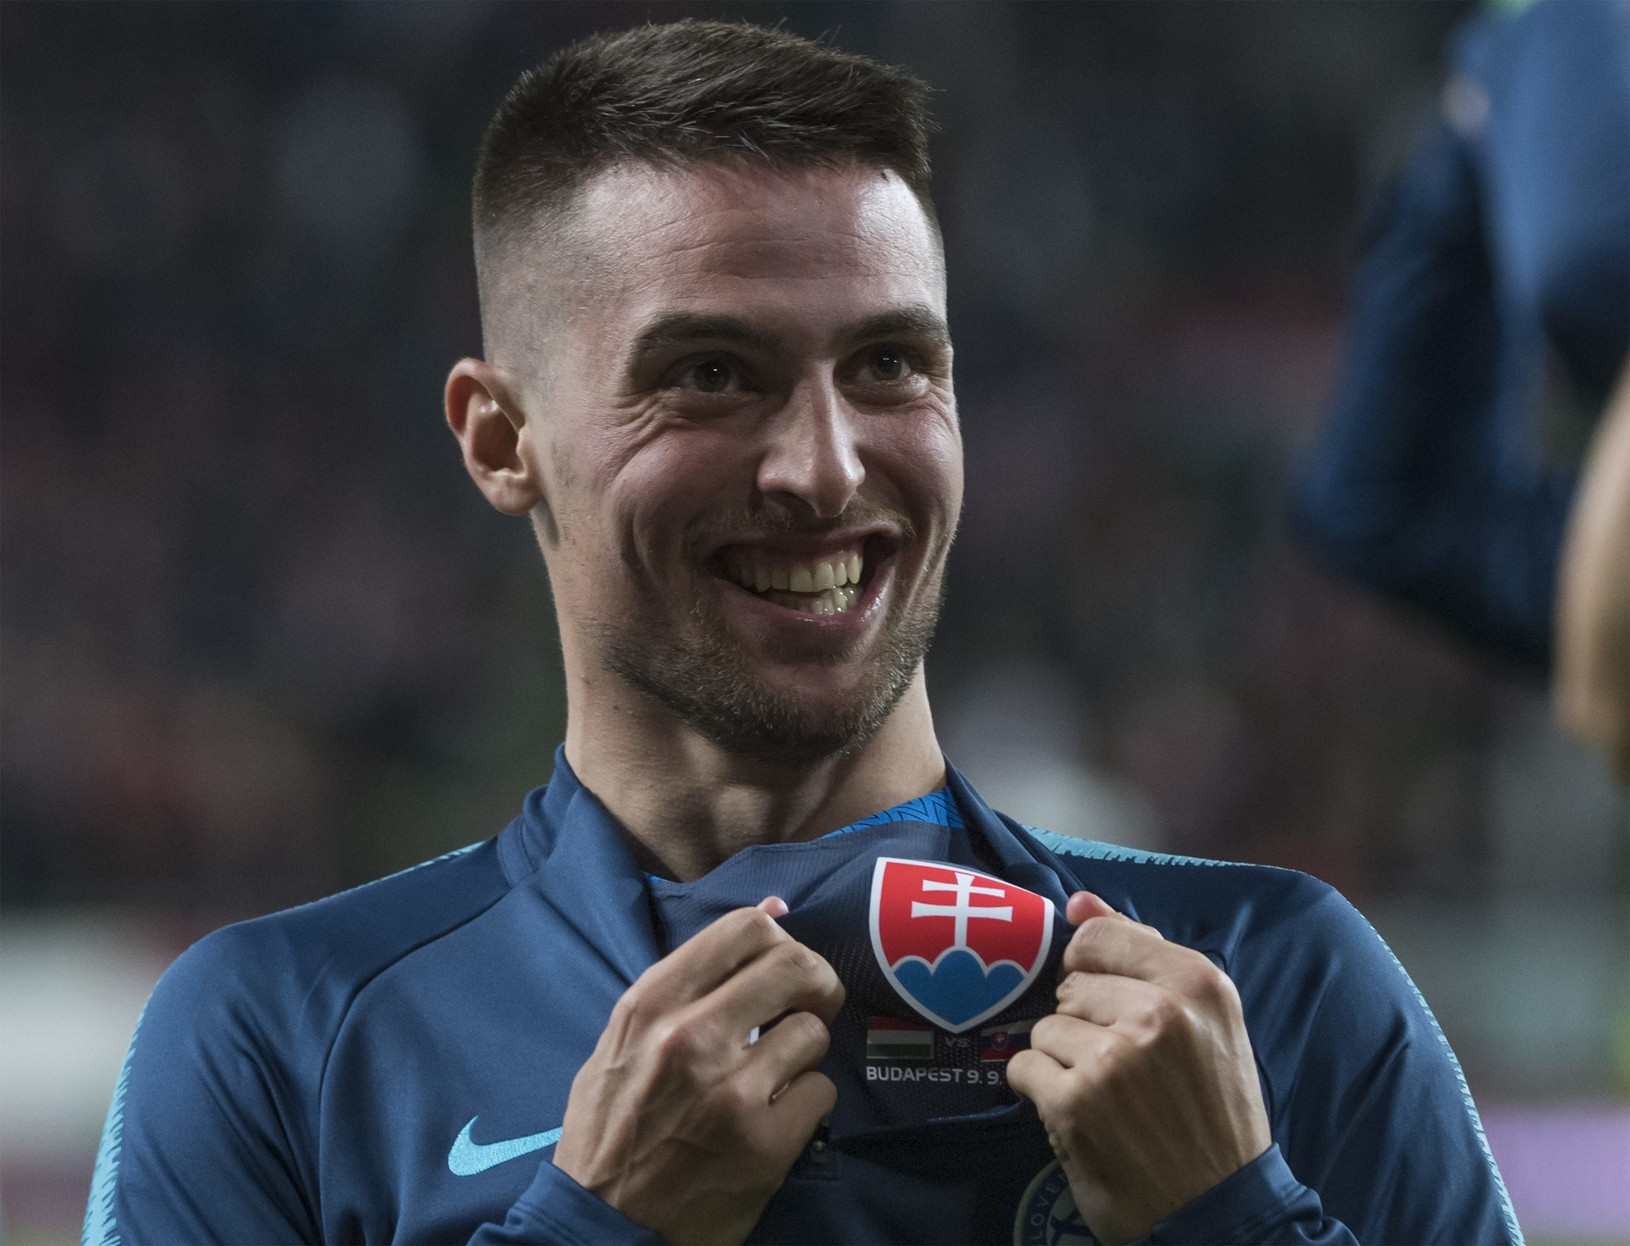 Radosť slovenského futbalistu Róberta